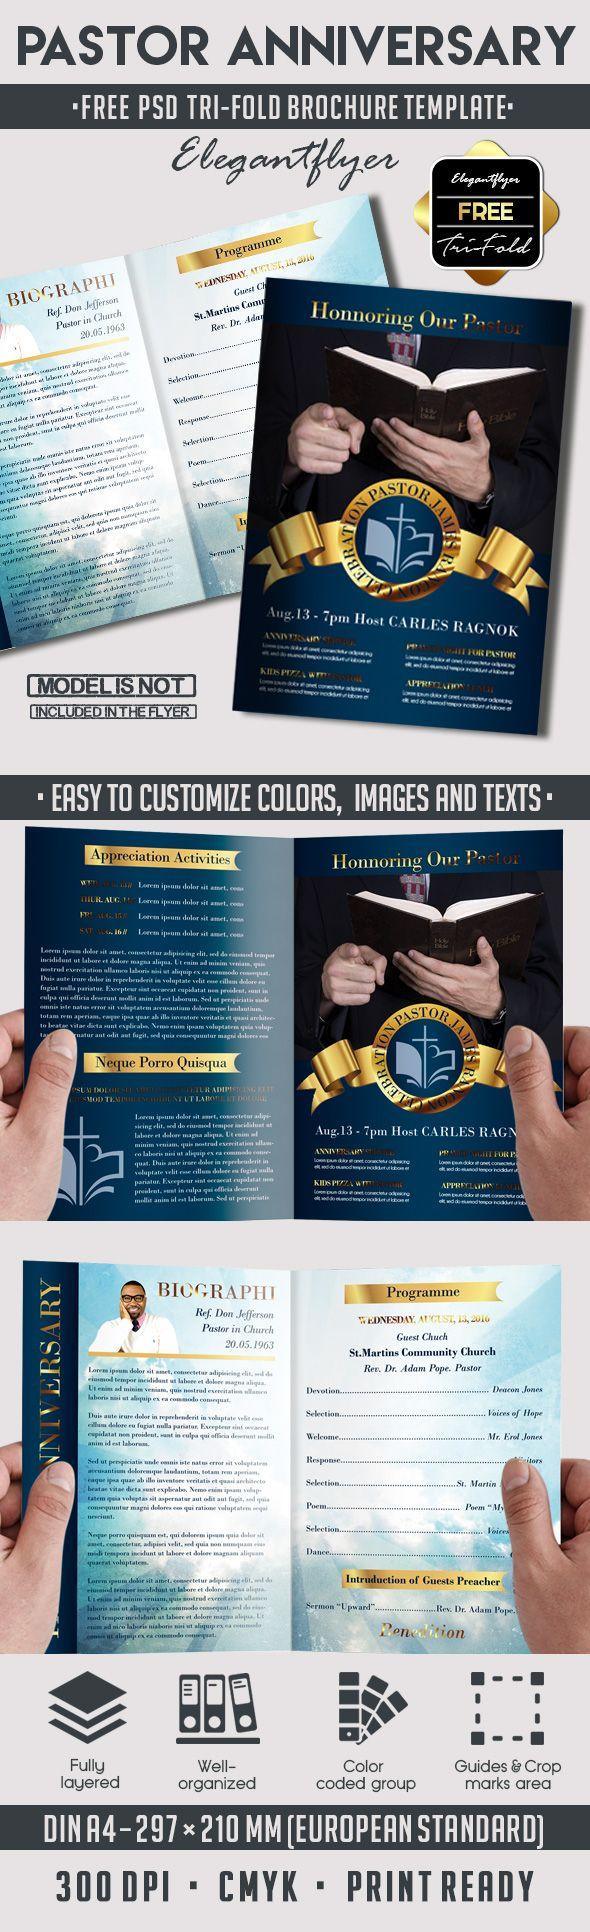 Pastor Anniversary Service Program – Free Bi-Fold PSD Brochure Template https://www.elegantflyer.com/free-psd-brochure-templates/pastor-anniversary-service-program-free-bi-fold-psd-brochure-template/